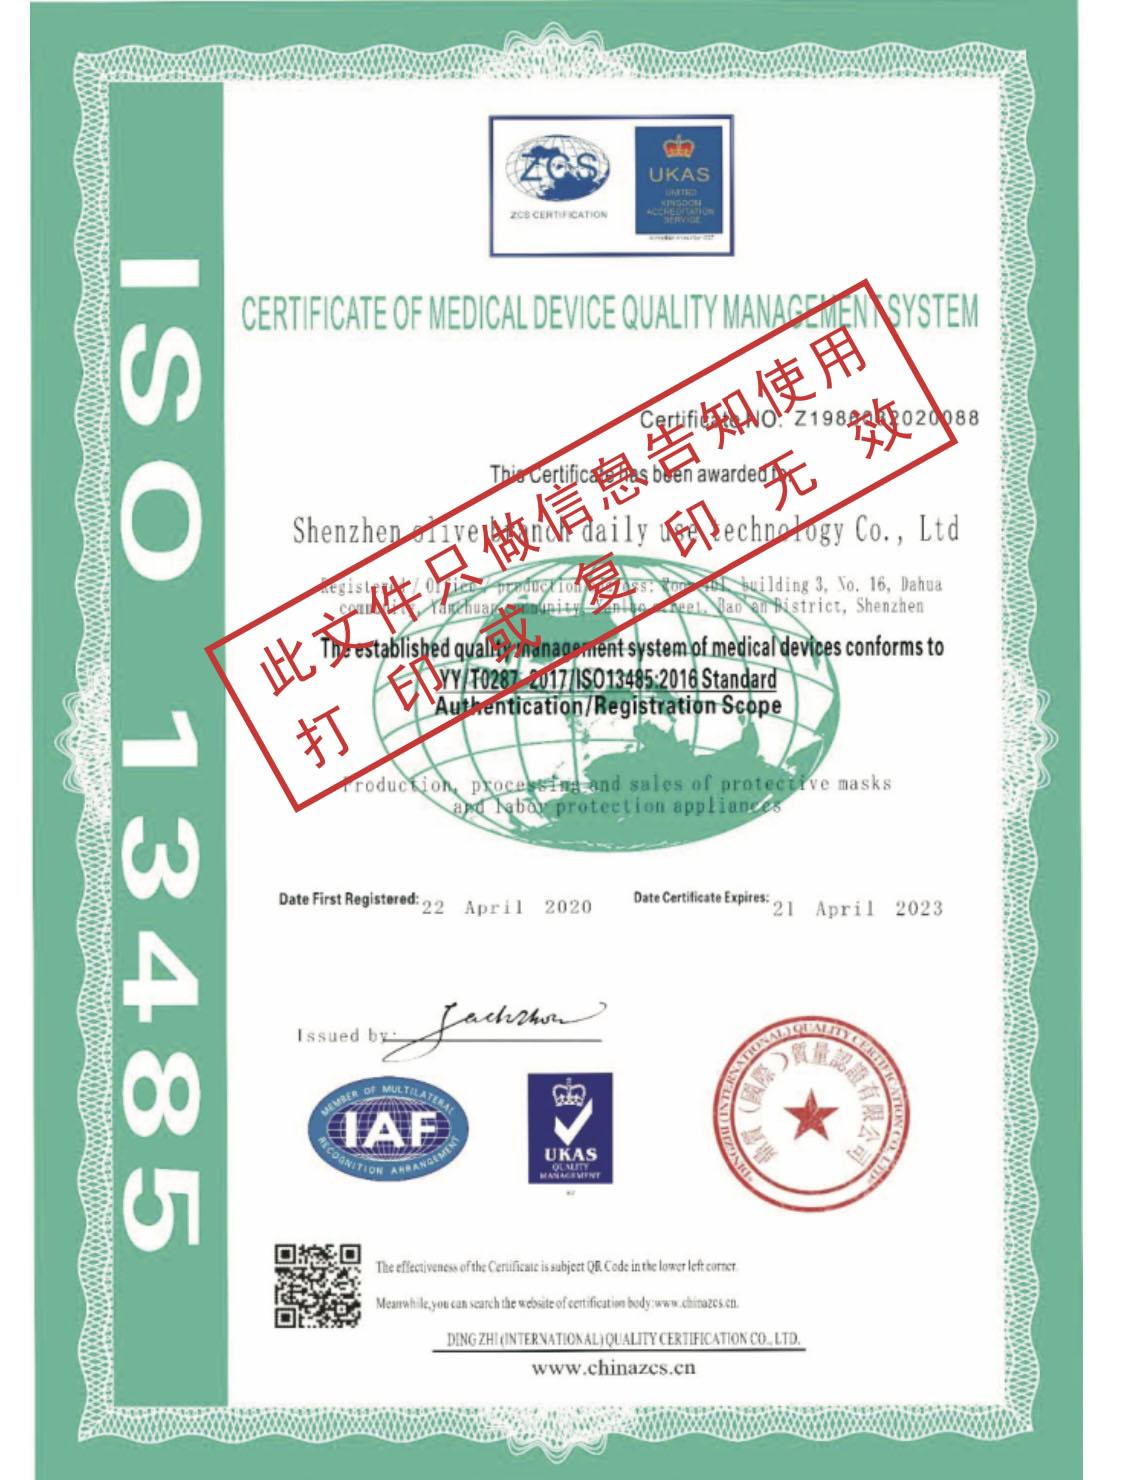 Máscara PFF2 / N95 / KN95 adulto azul - pacote 10 unidades 5 camadas meltblow BFE 98% + feltro de coton + tnt spunbond hospitalar hipoalergenico